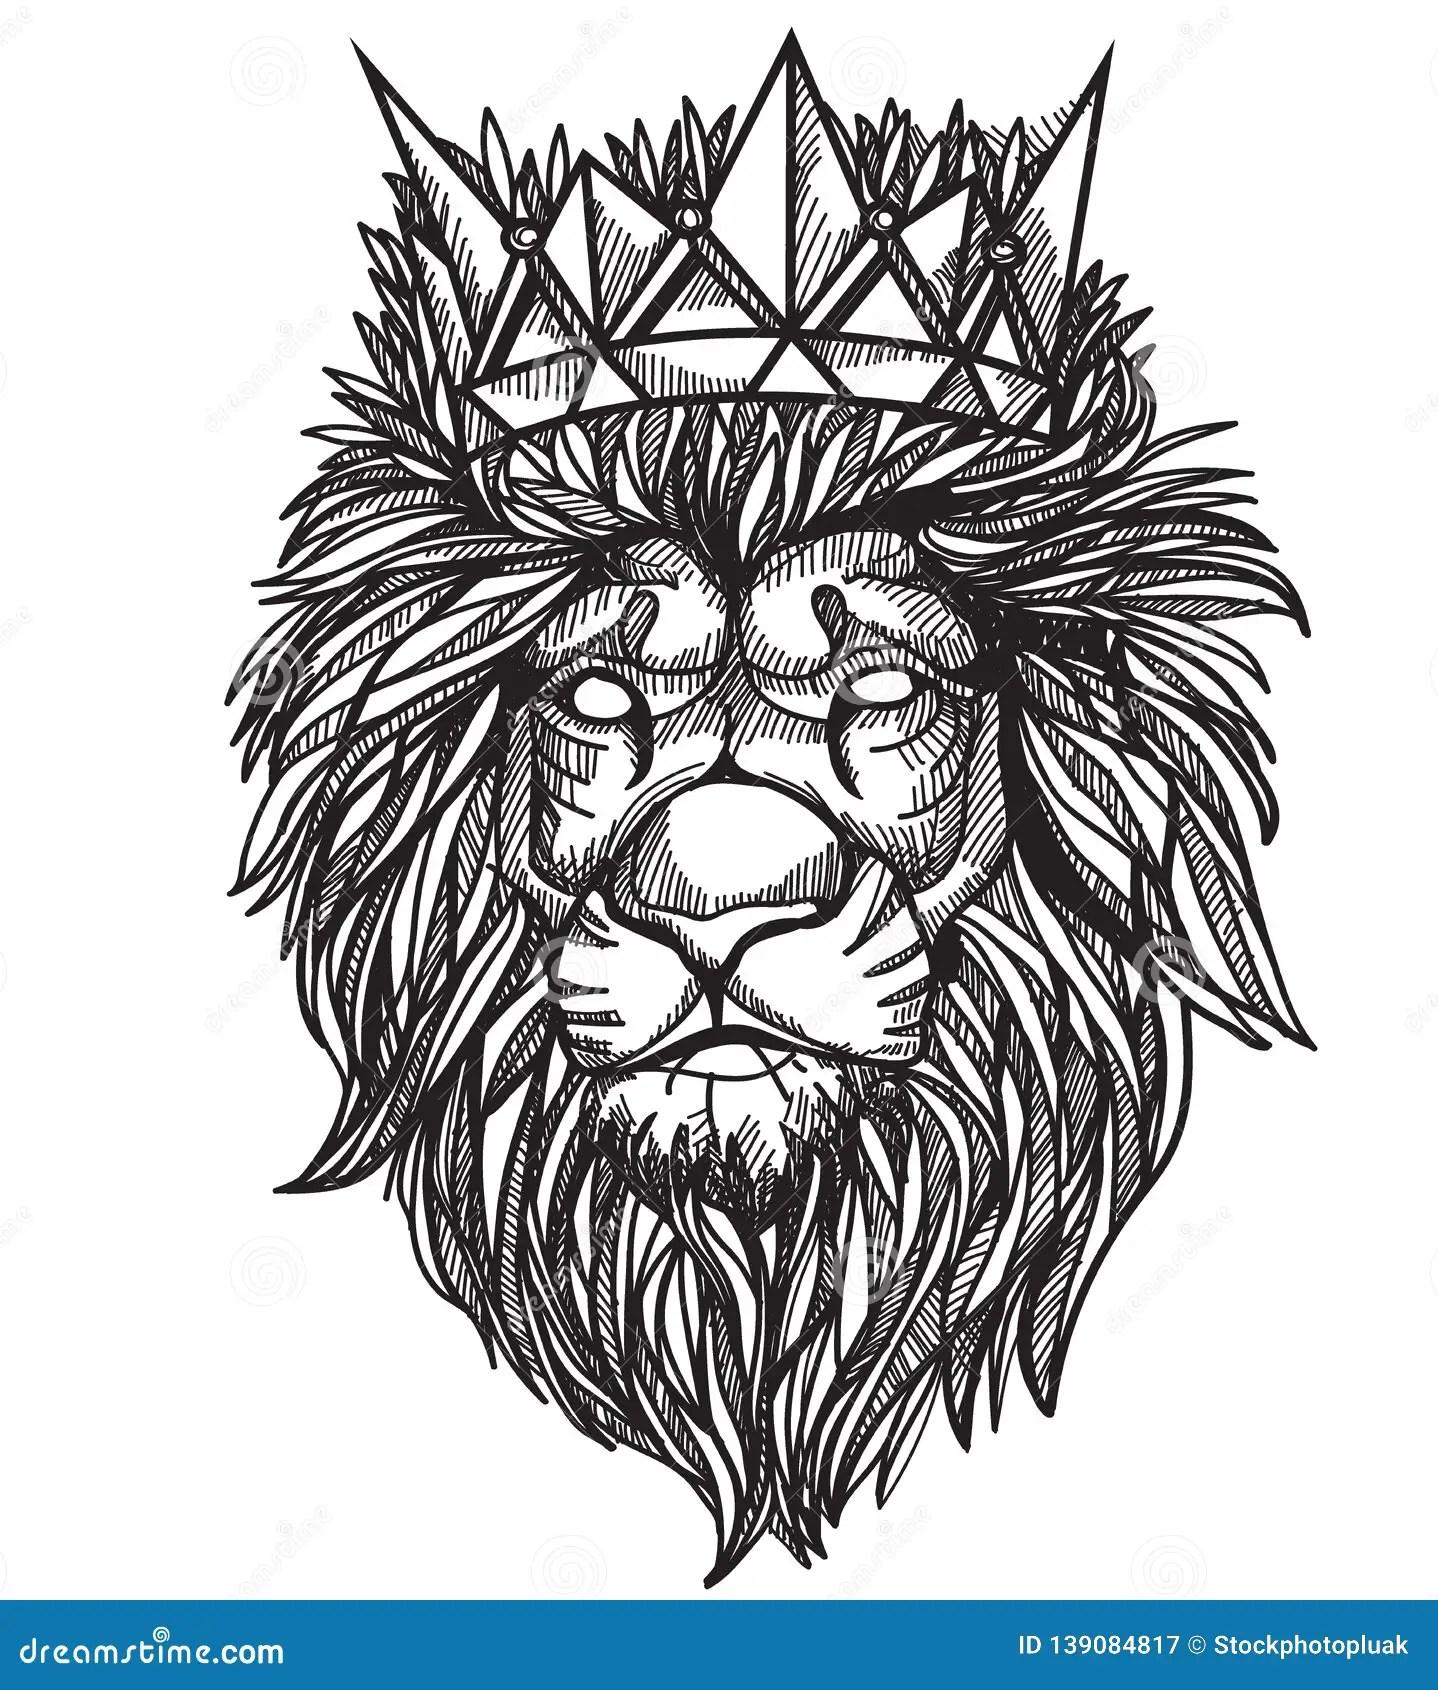 tattoo art lion hand